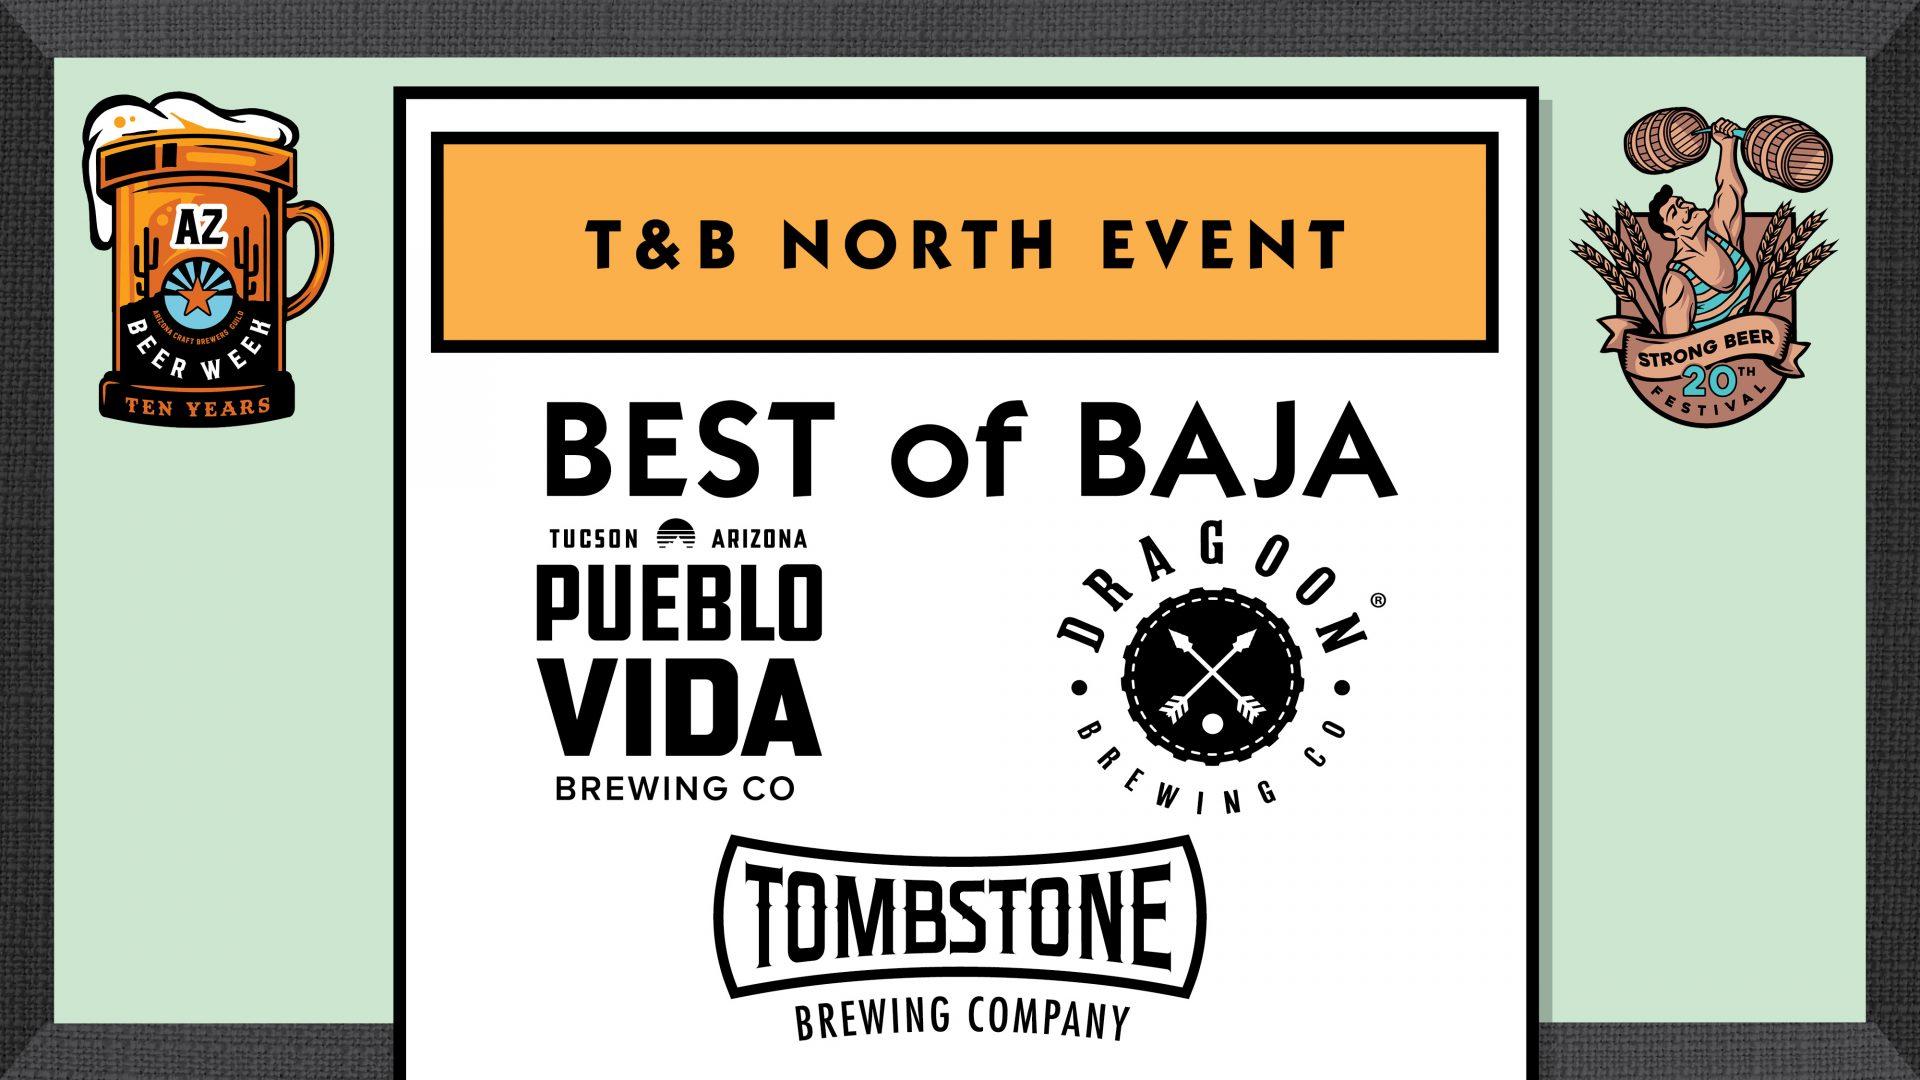 Best of Baja at T&B North!